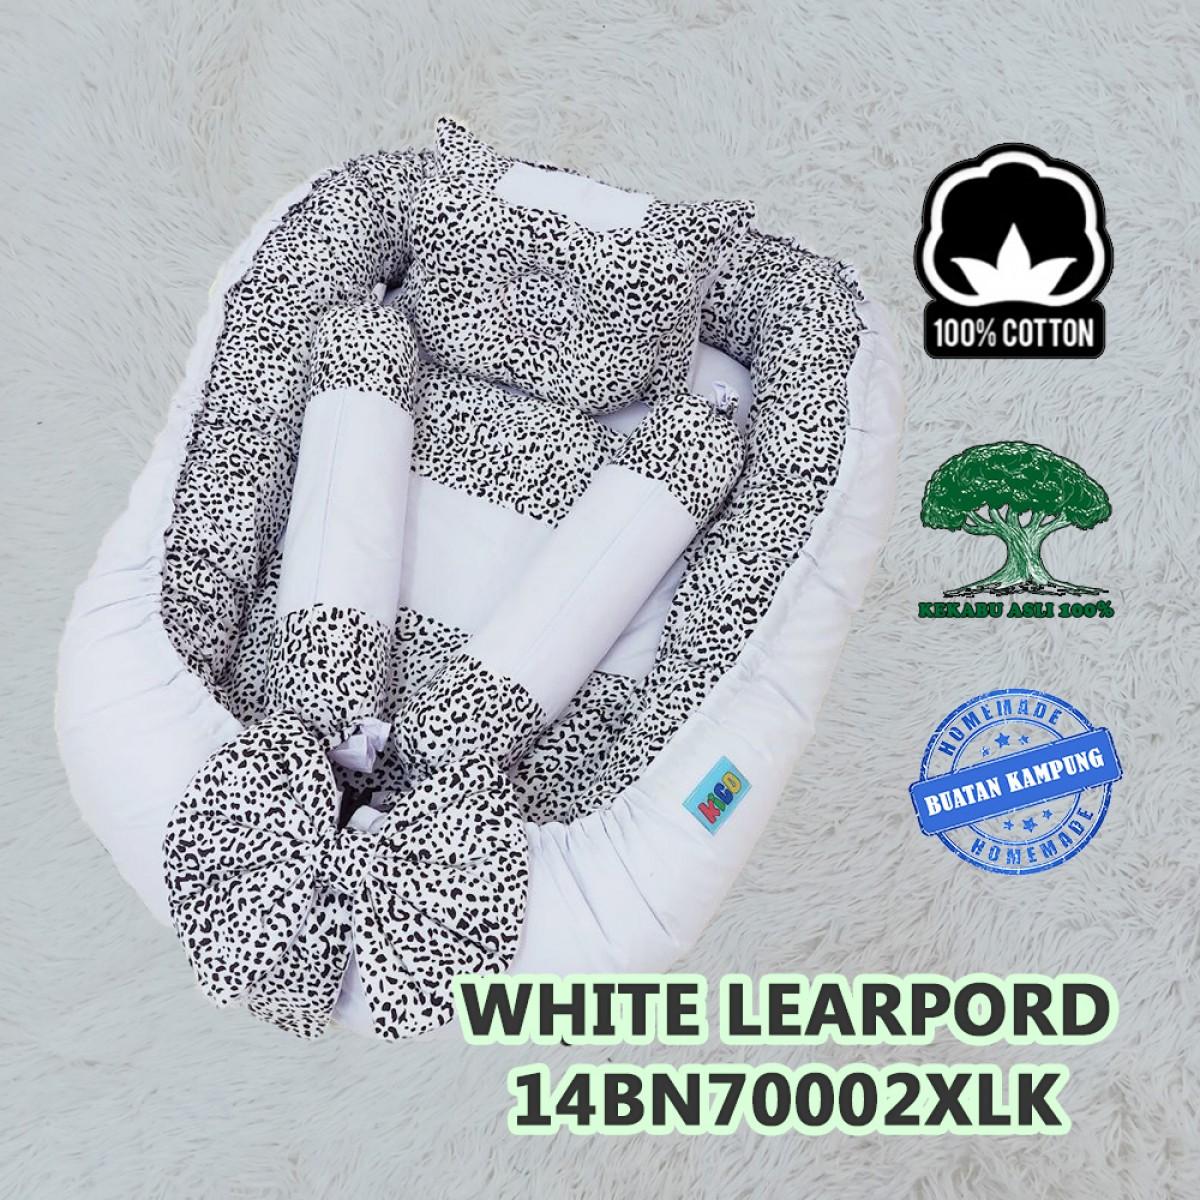 White Learpord - Kico Baby Center